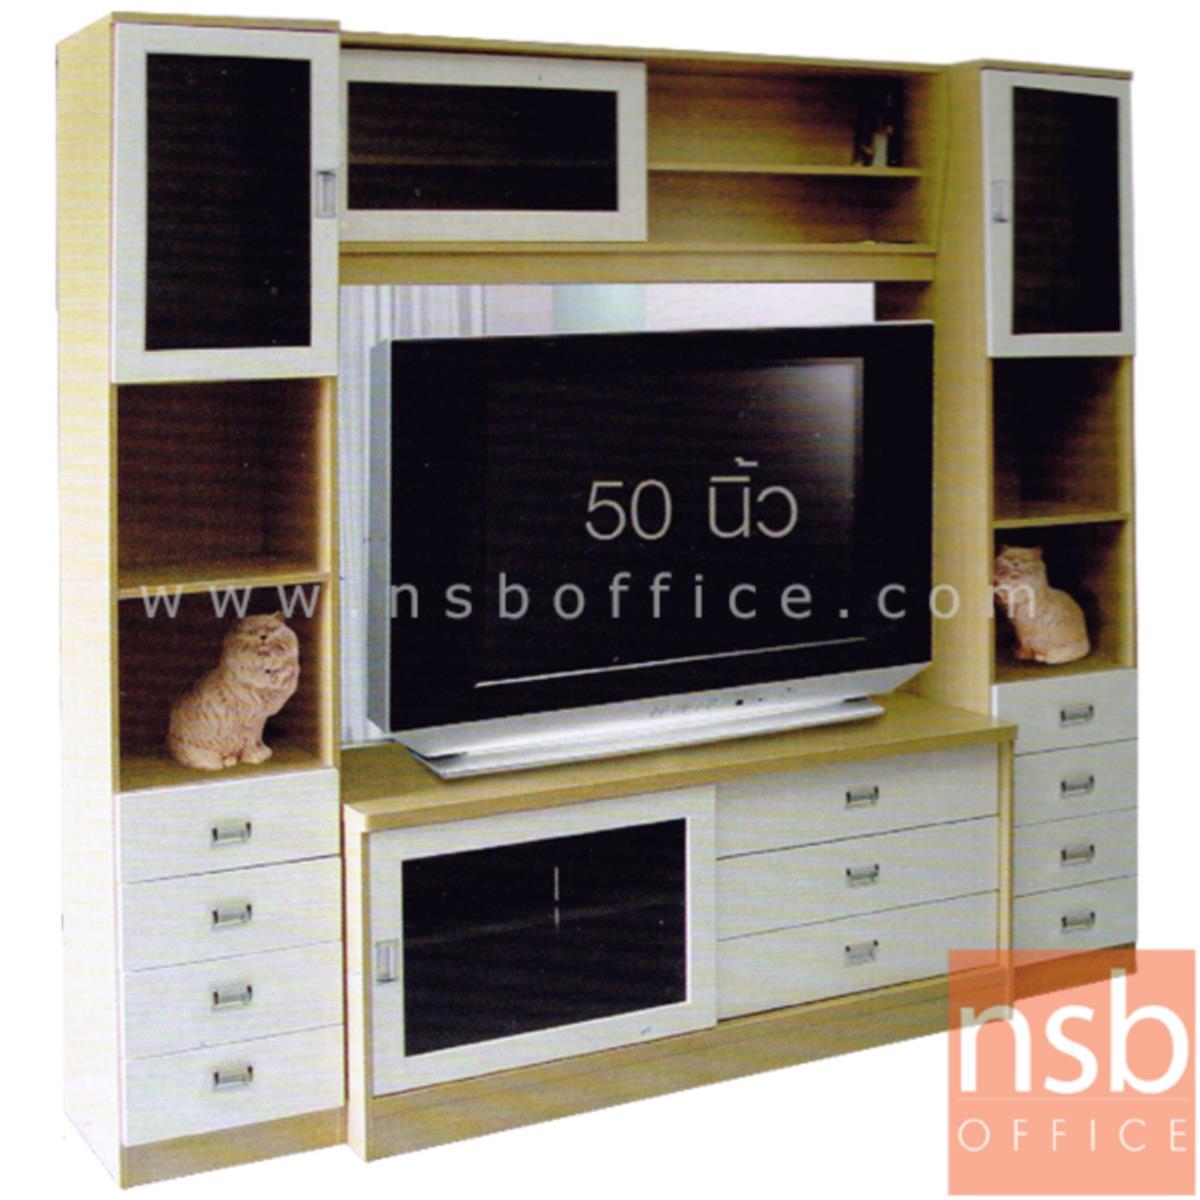 C08A022:ชุดตู้วางทีวีต่อสูง 200 ซม. รุ่น Garner (การ์เนอร์)  ผลิตจากไม้ปาร์ติเกิลบอร์ด